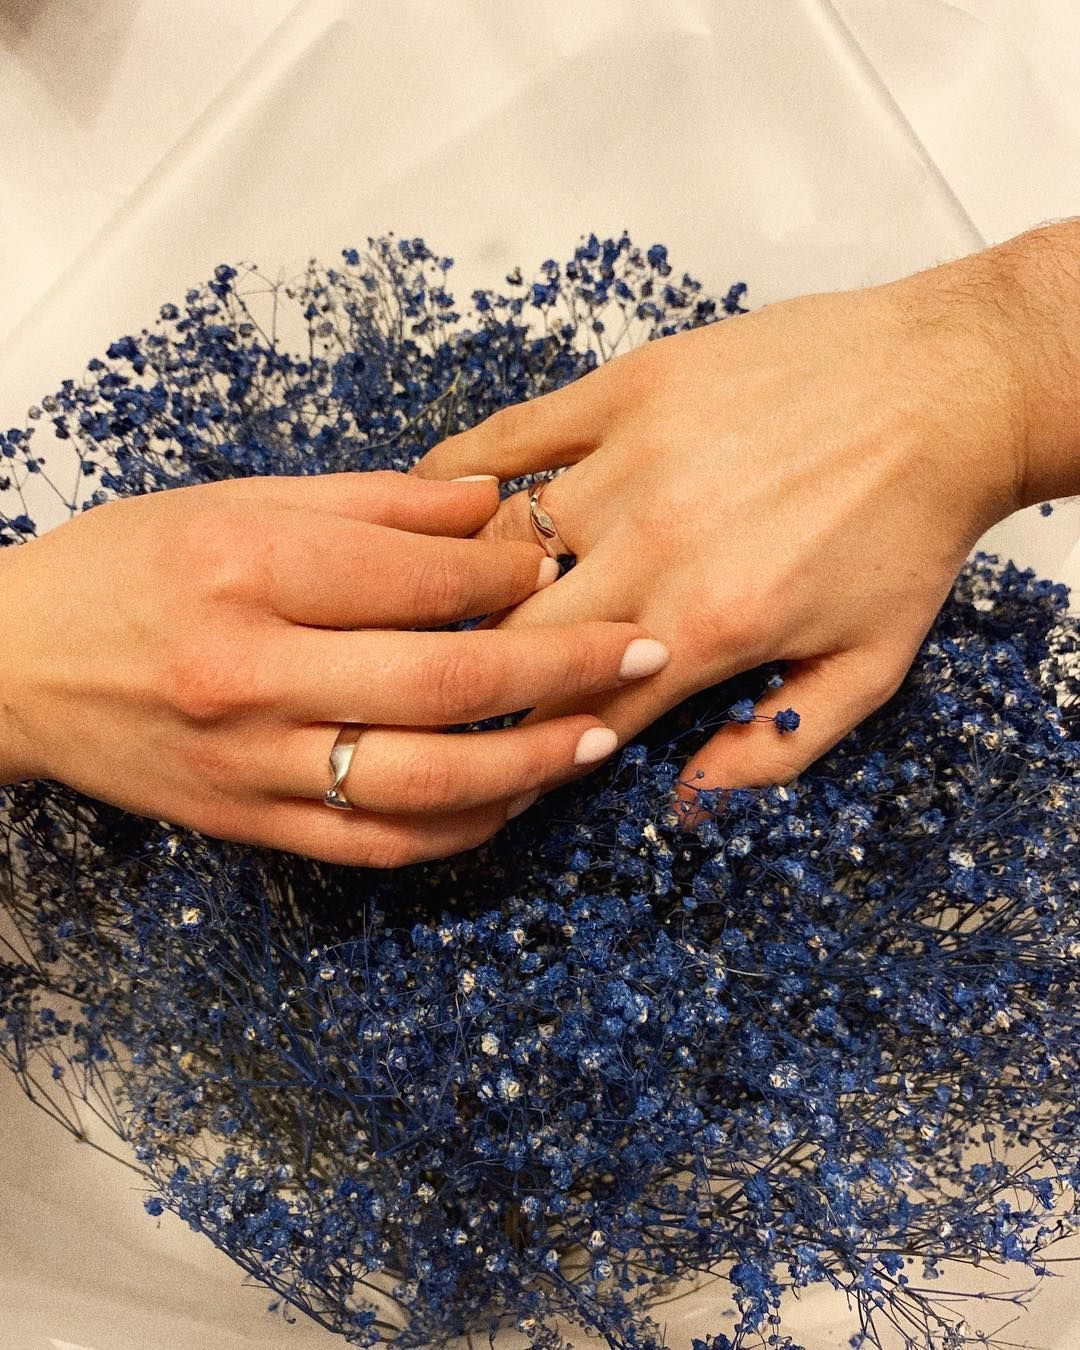 Євген Кот одружився